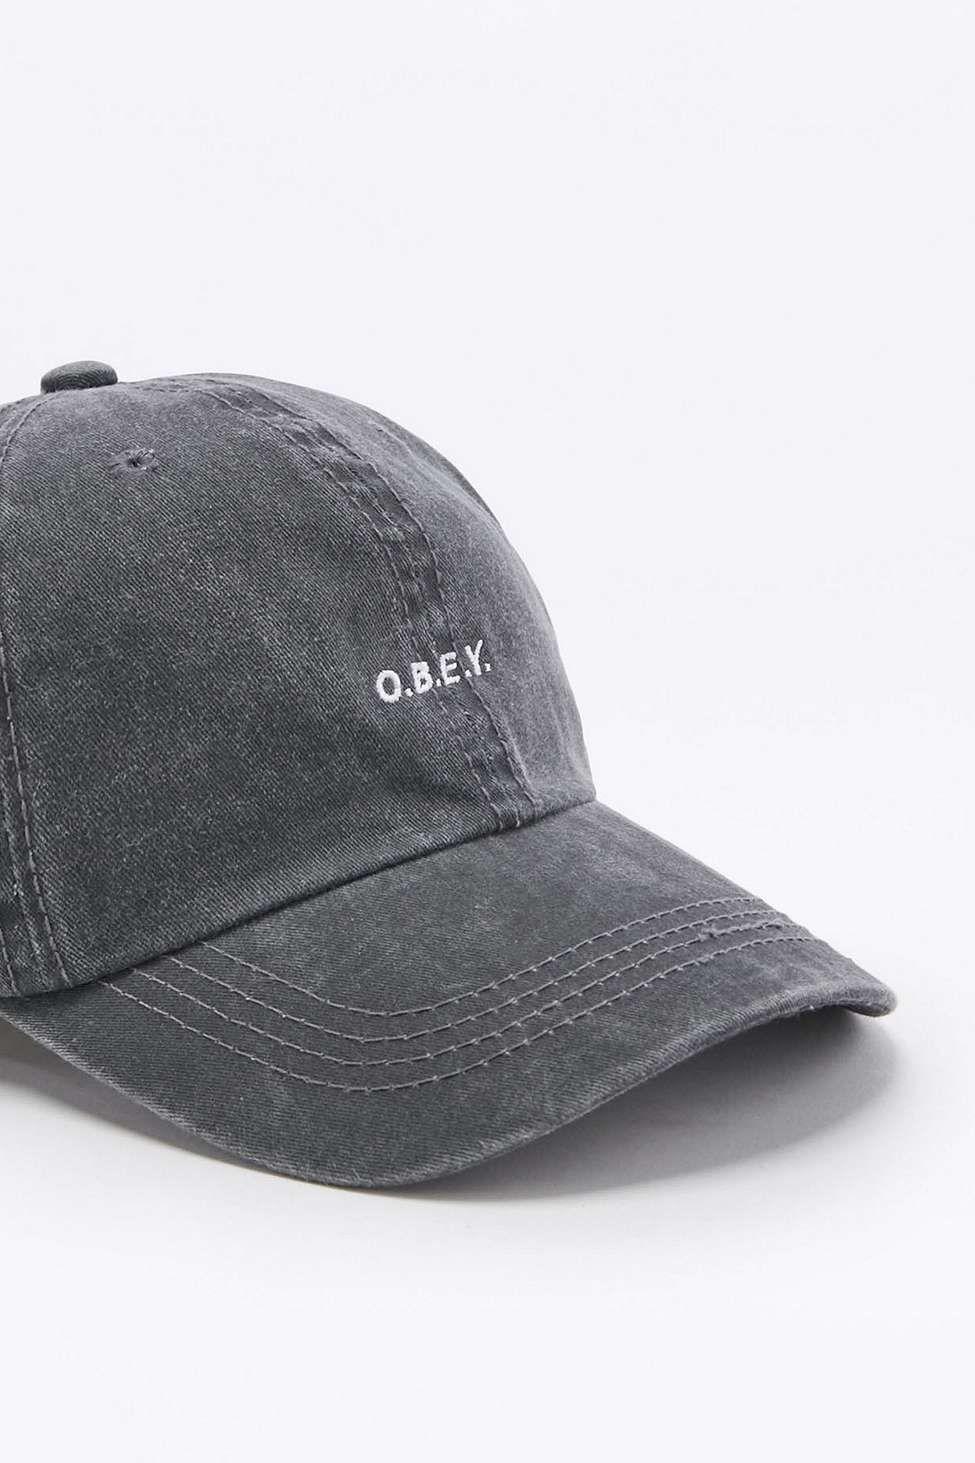 Obey Quickstrike Black Cap